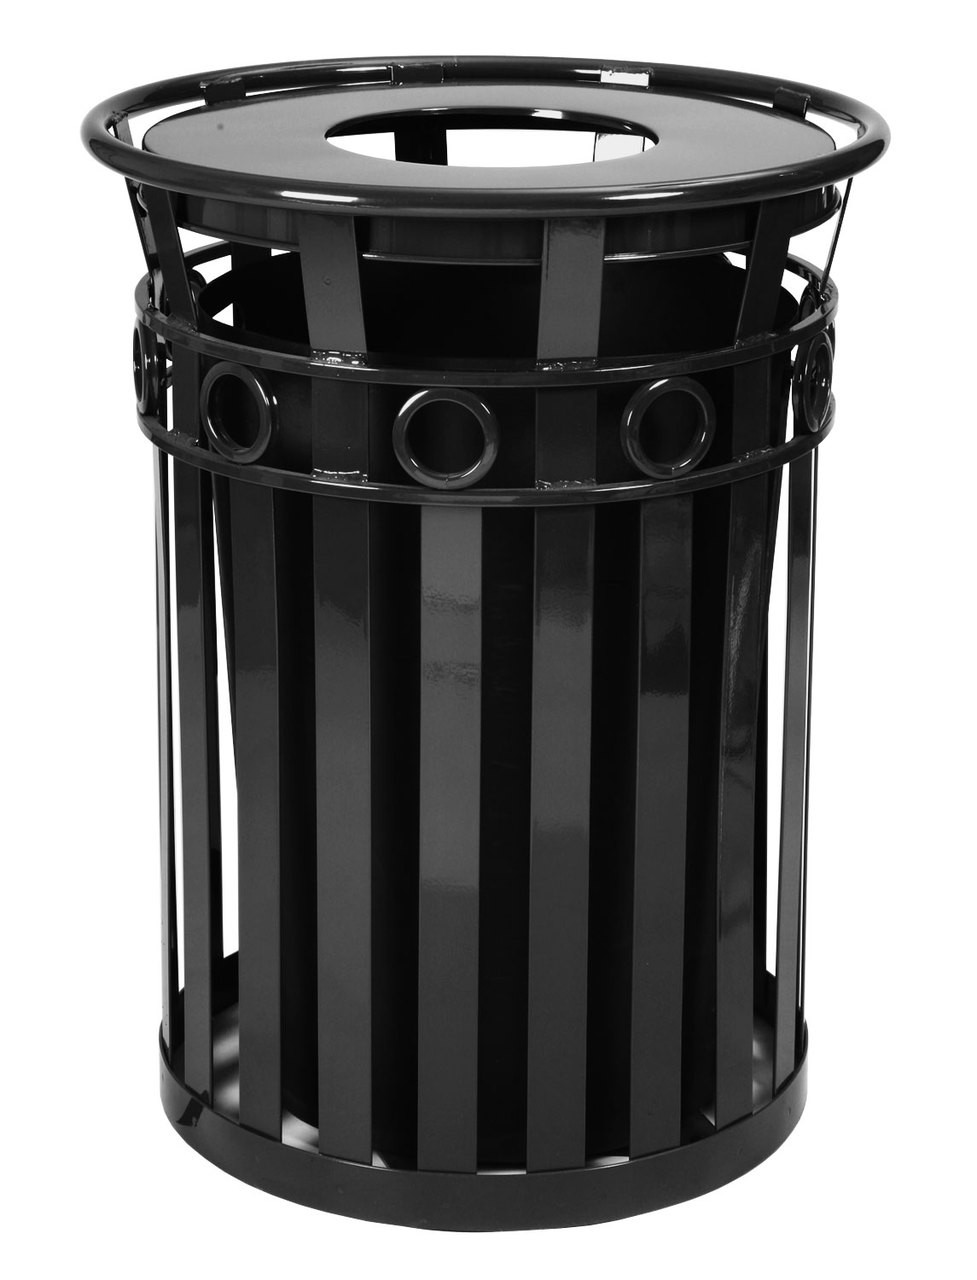 36 Gallon Oakley M3600-R-FT-BK Outdoor Waste Receptacle Black